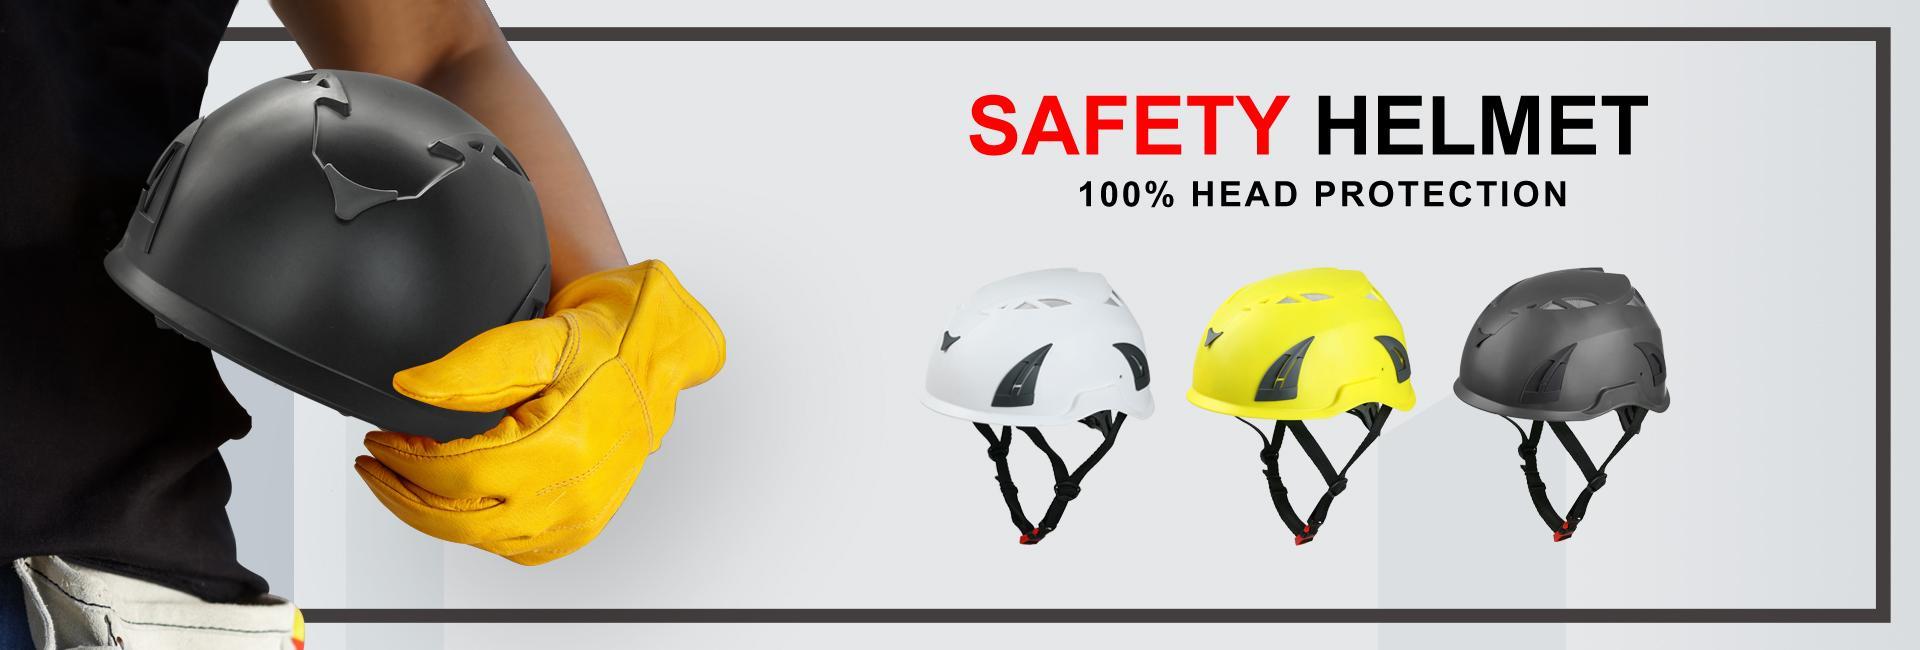 Work At Height Safety Helmet 6